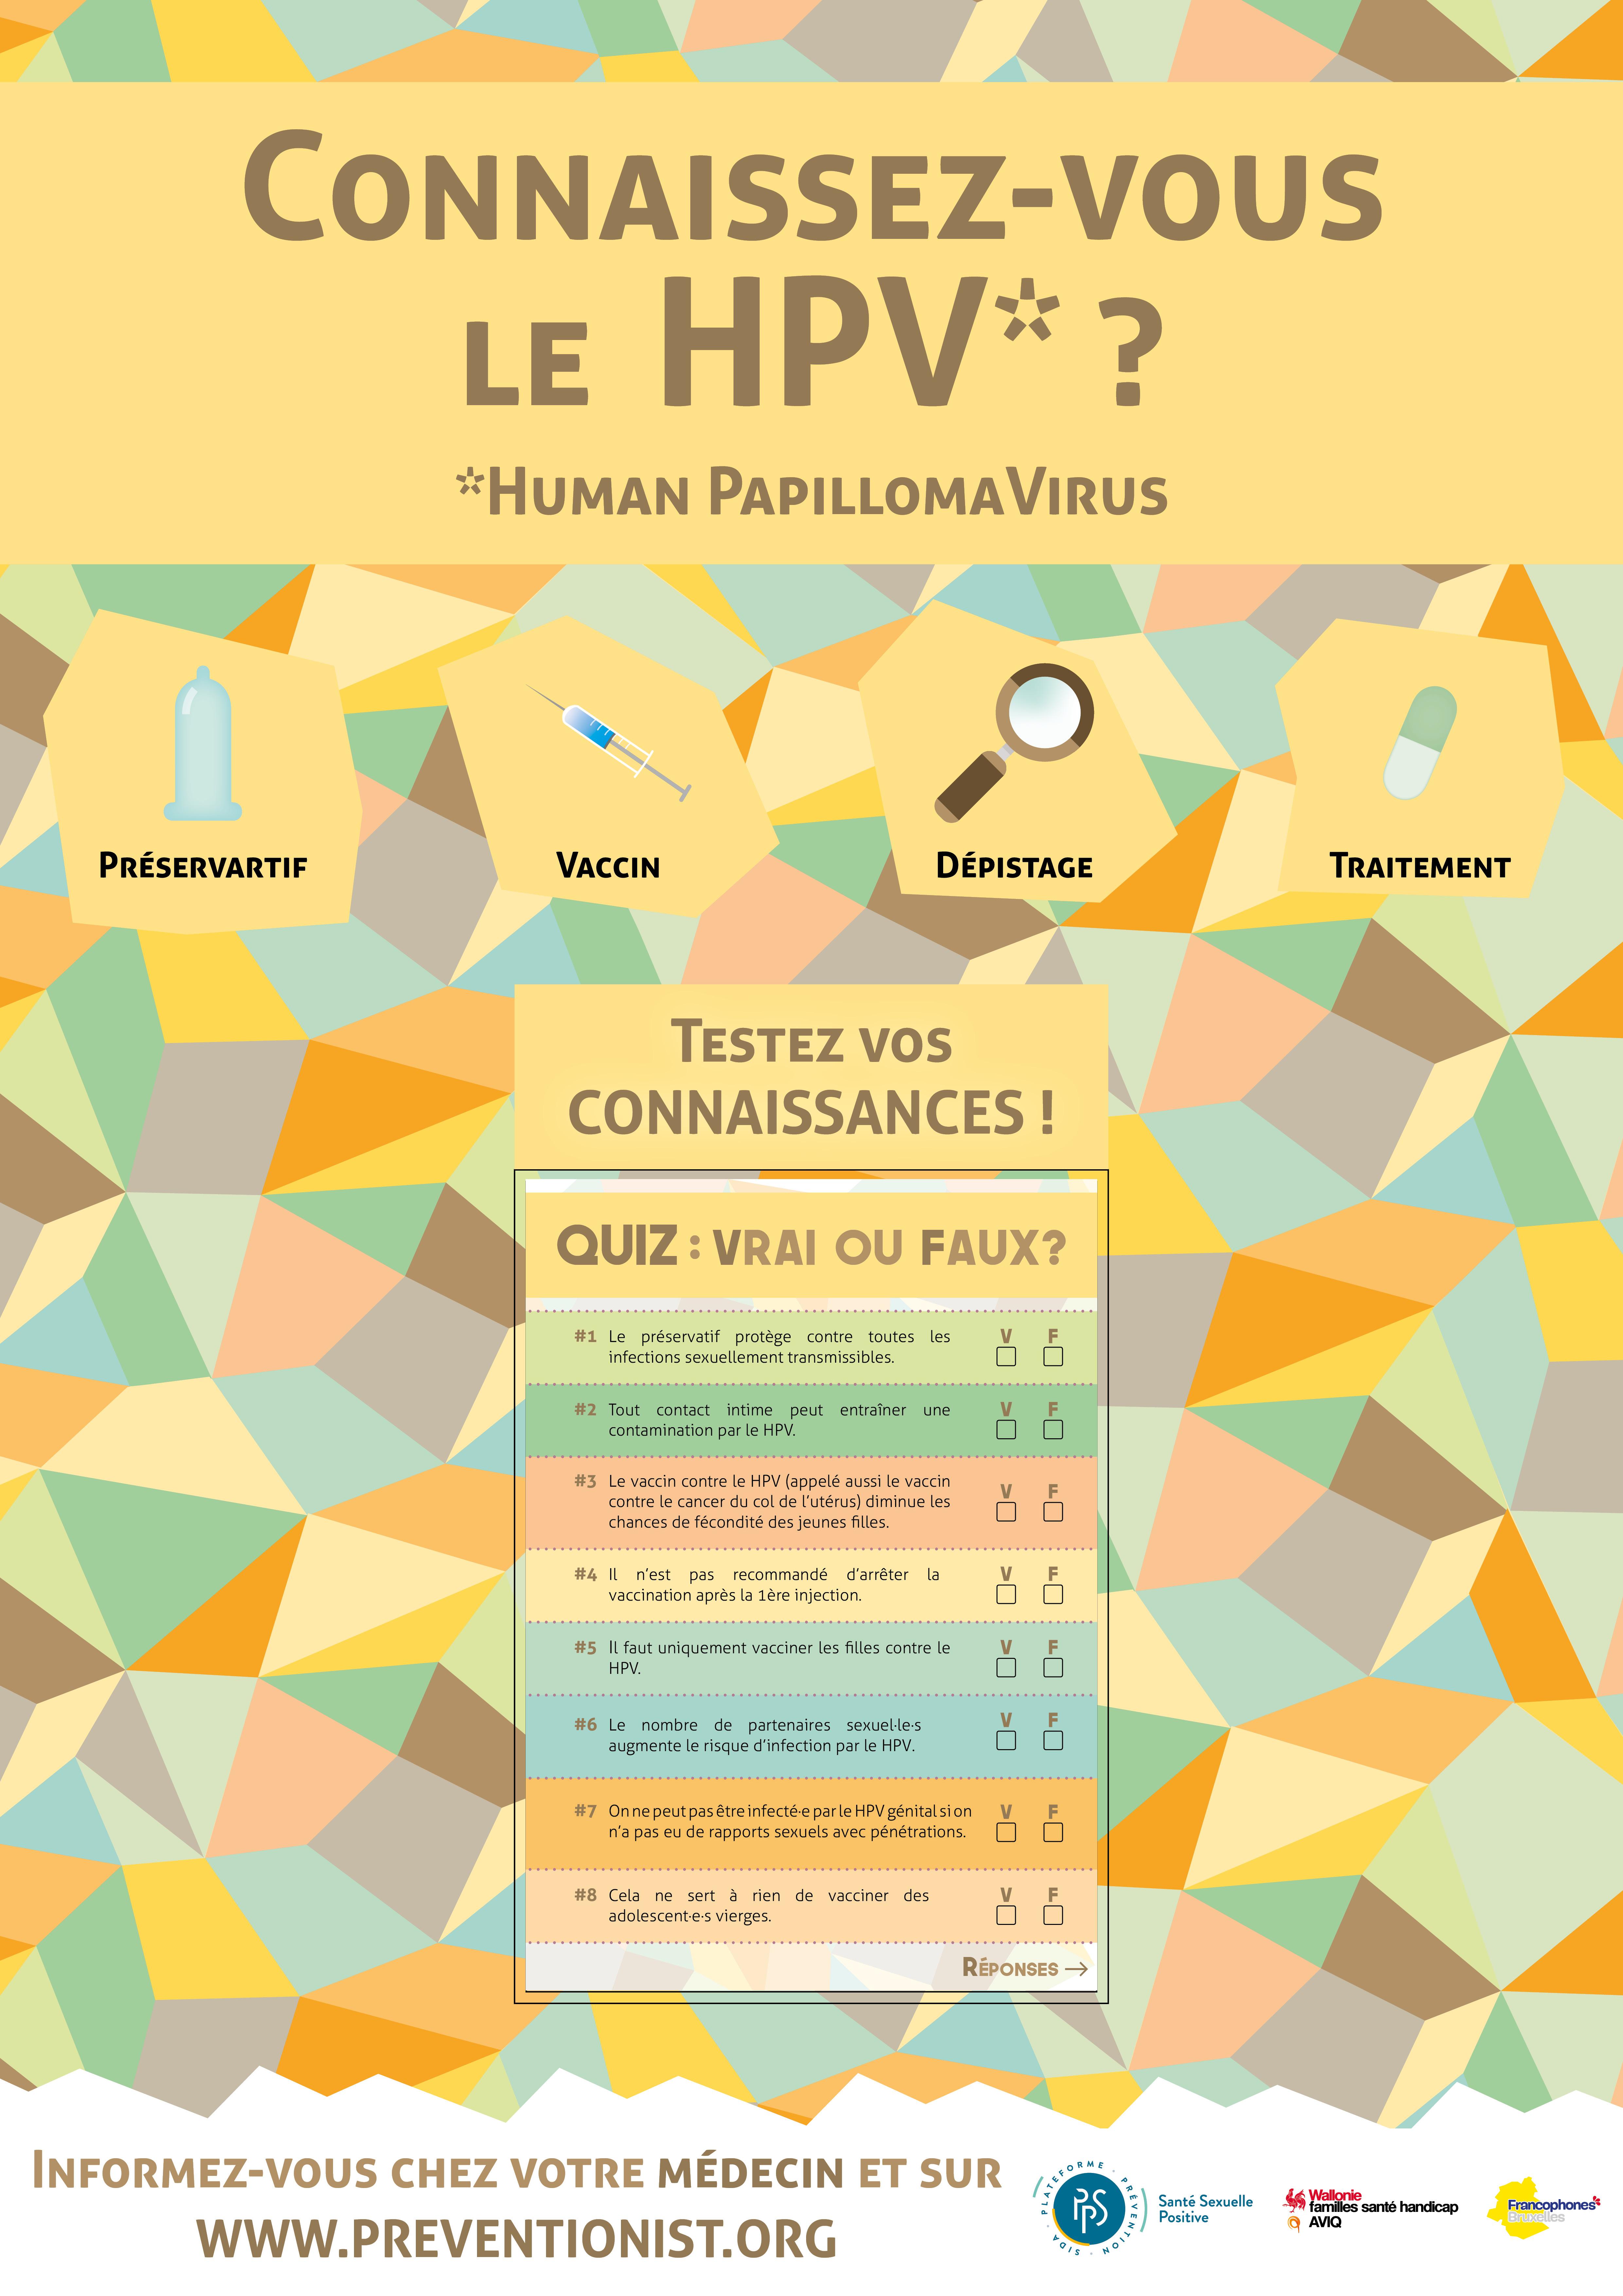 hpv preservatif a vie)